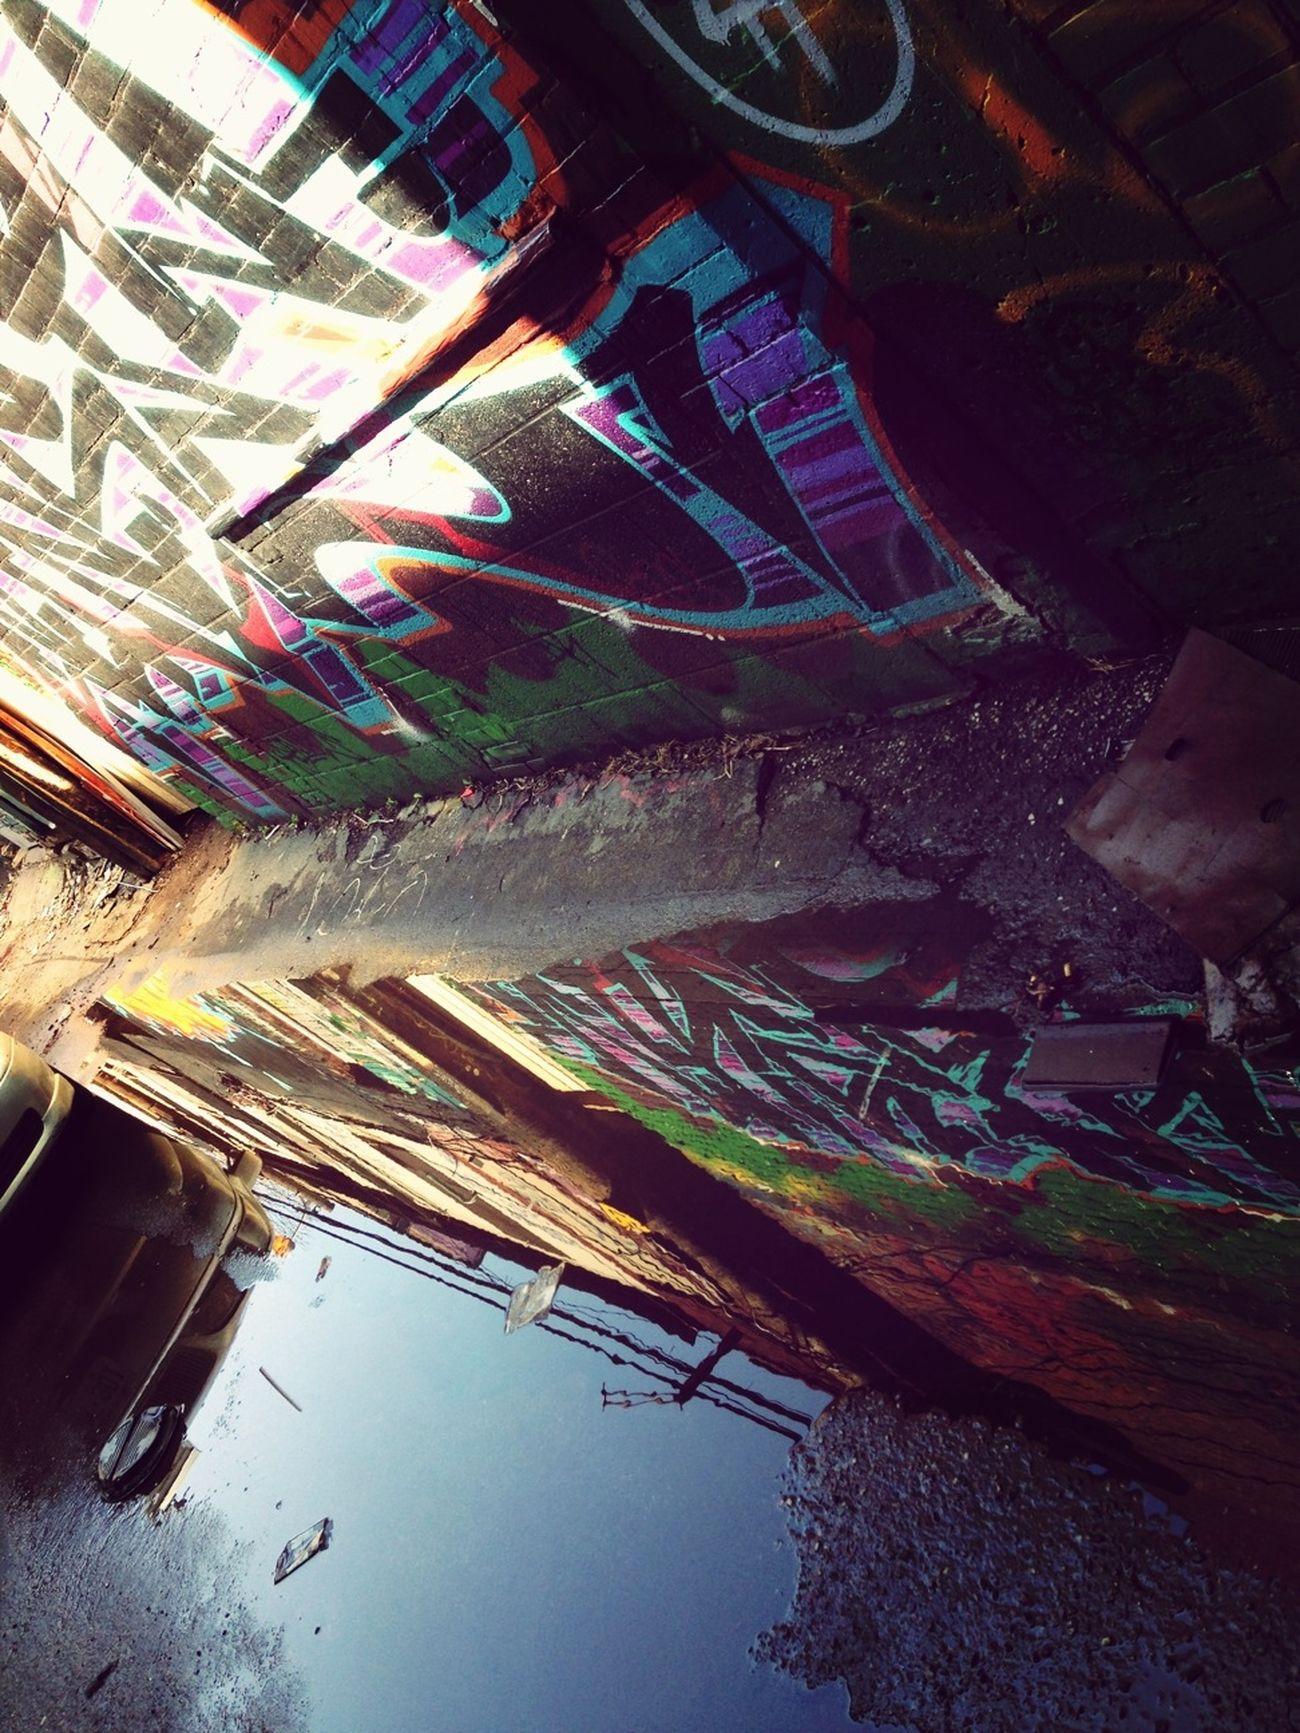 Graffitti Urban Reflections Water Reflections Admiring Art